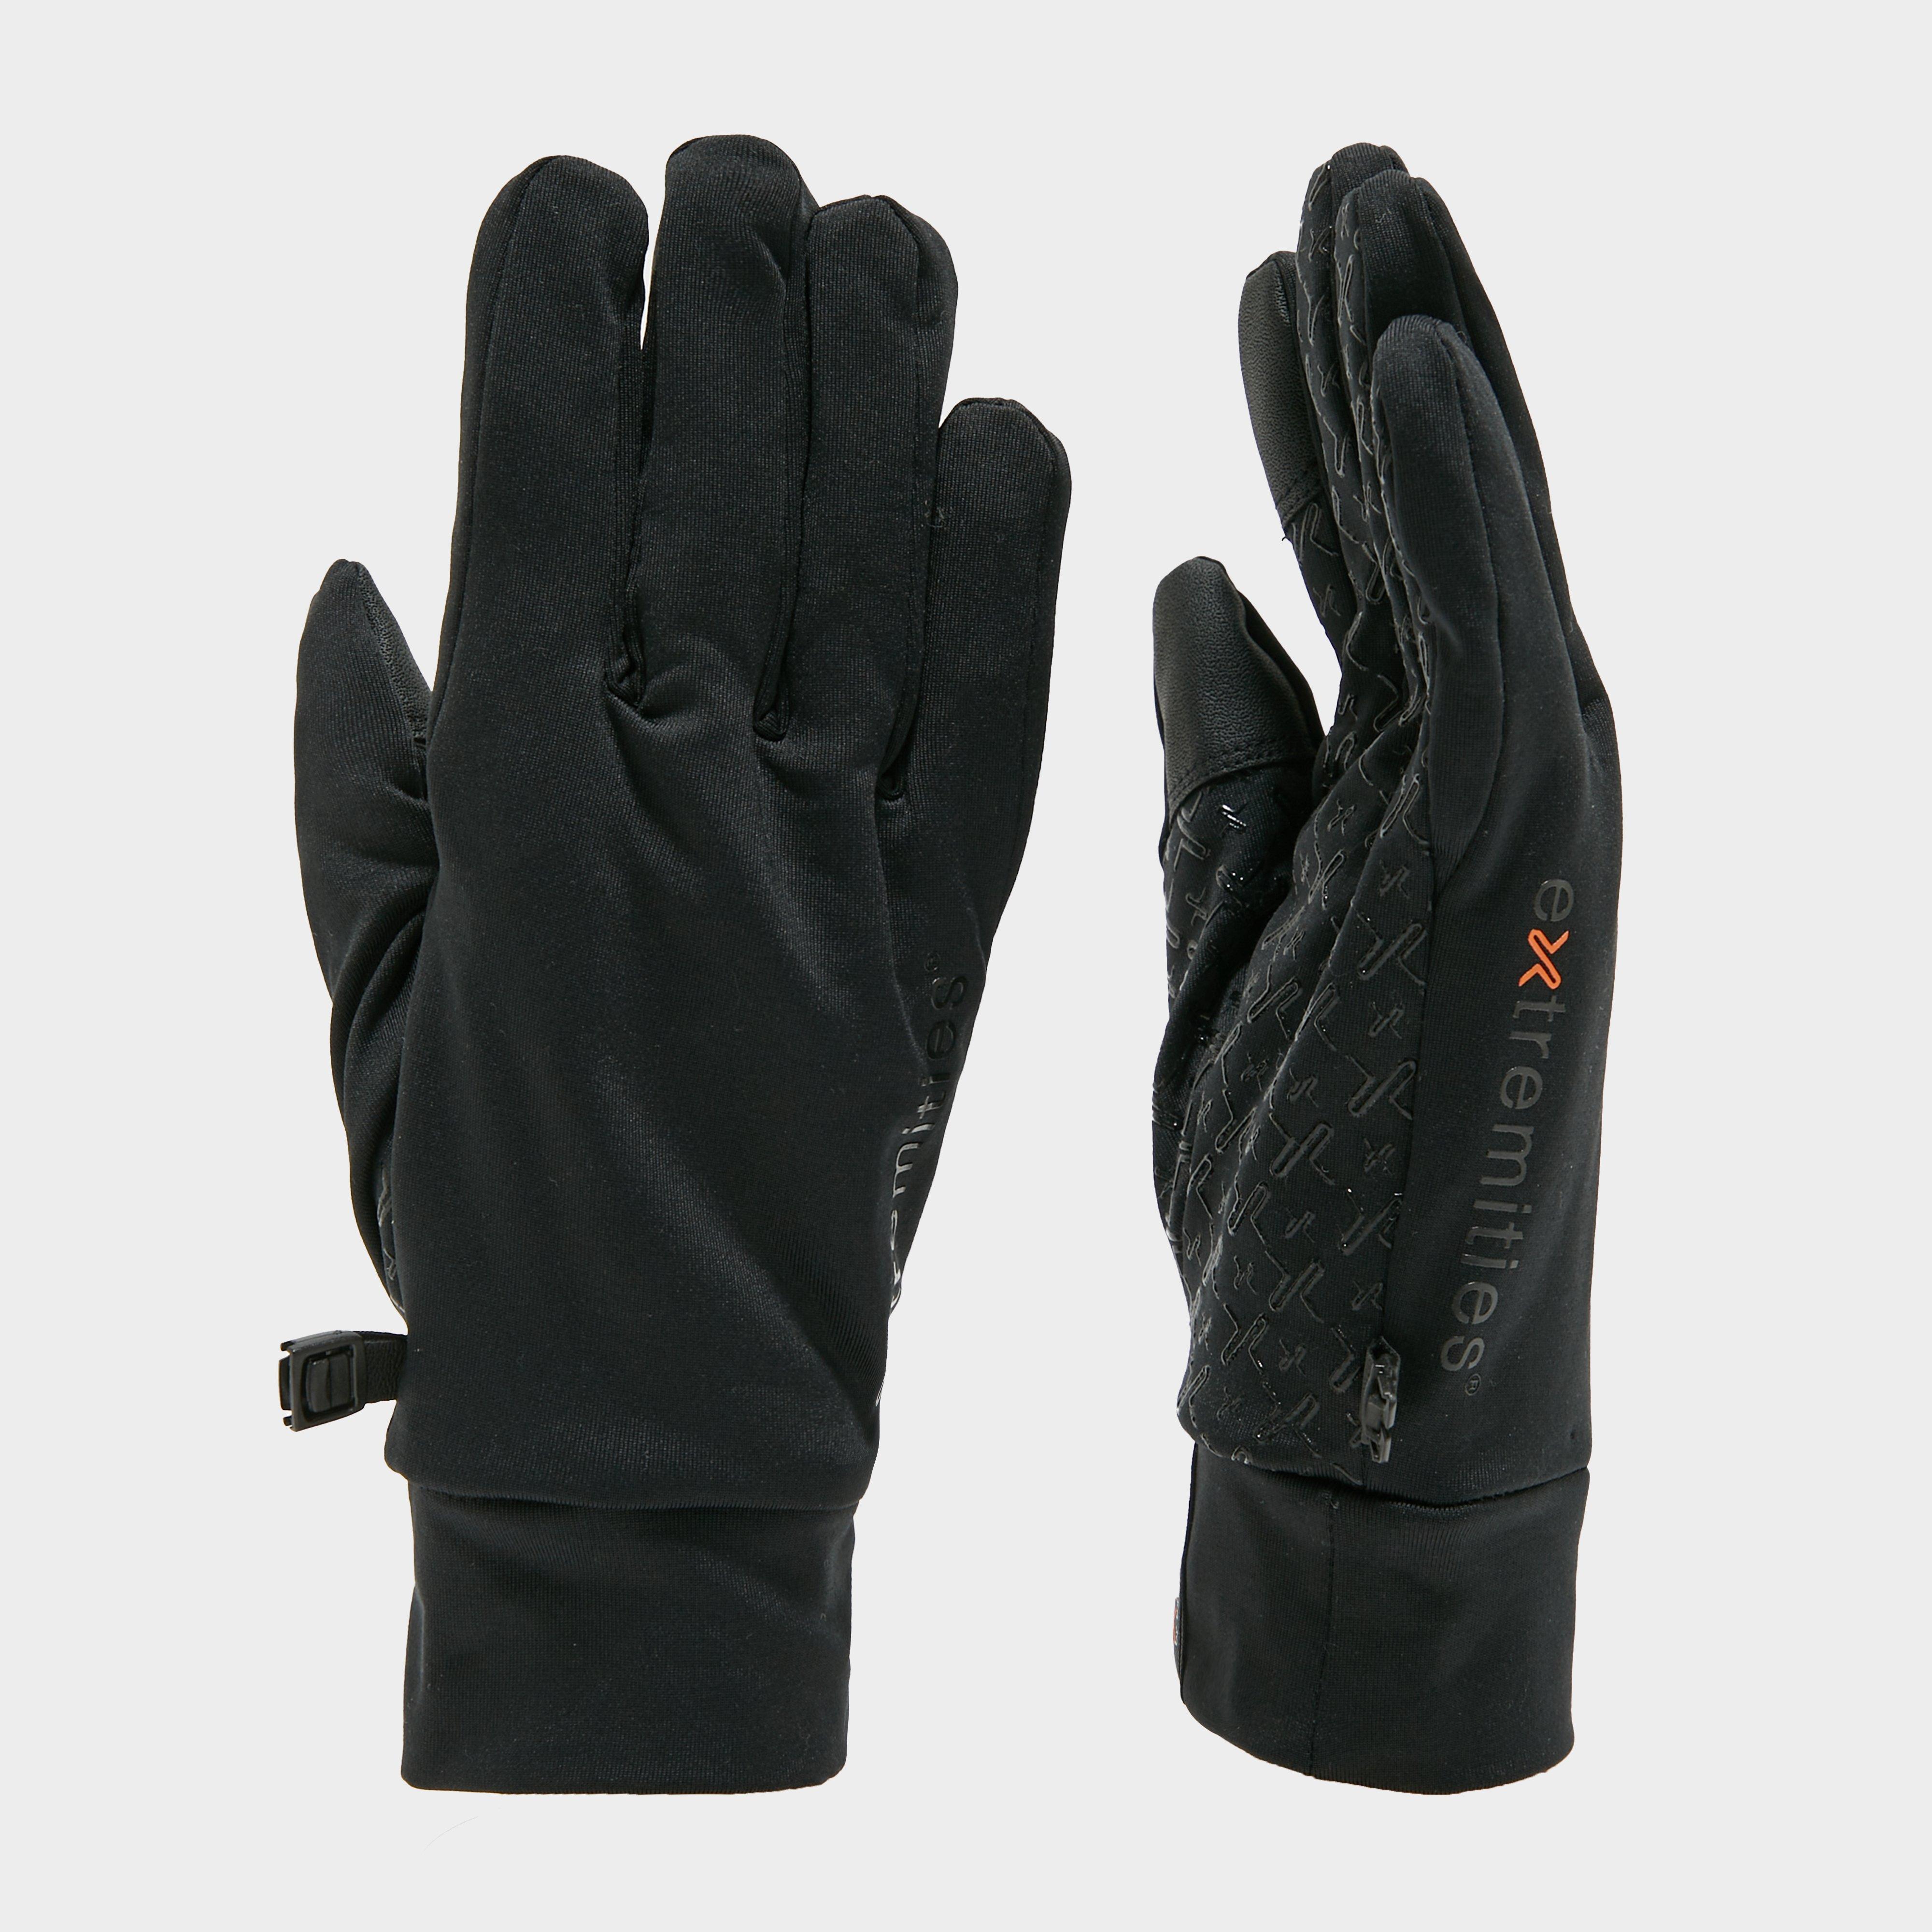 Extremities Extremities Waterproof Sticky Power Liner Glove - Black, Black